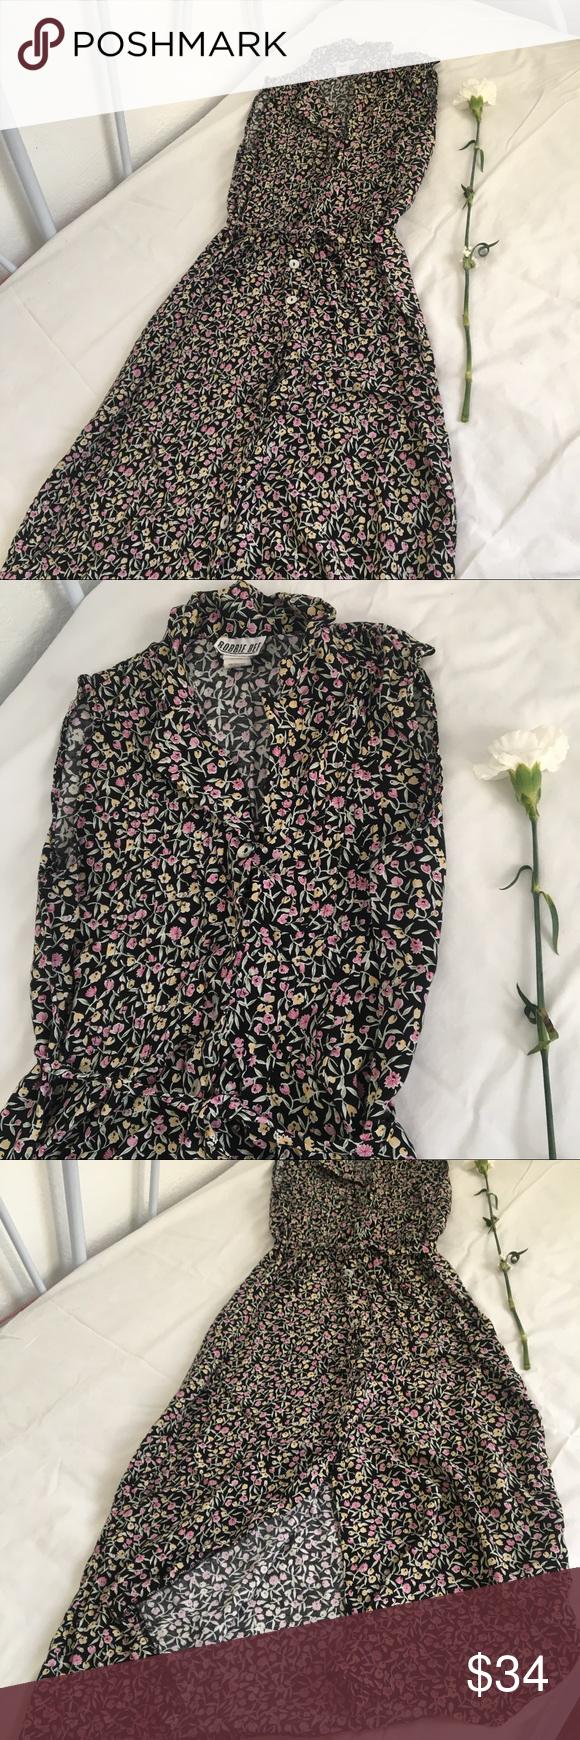 Robbie bee long floral pattern dress size beautiful long